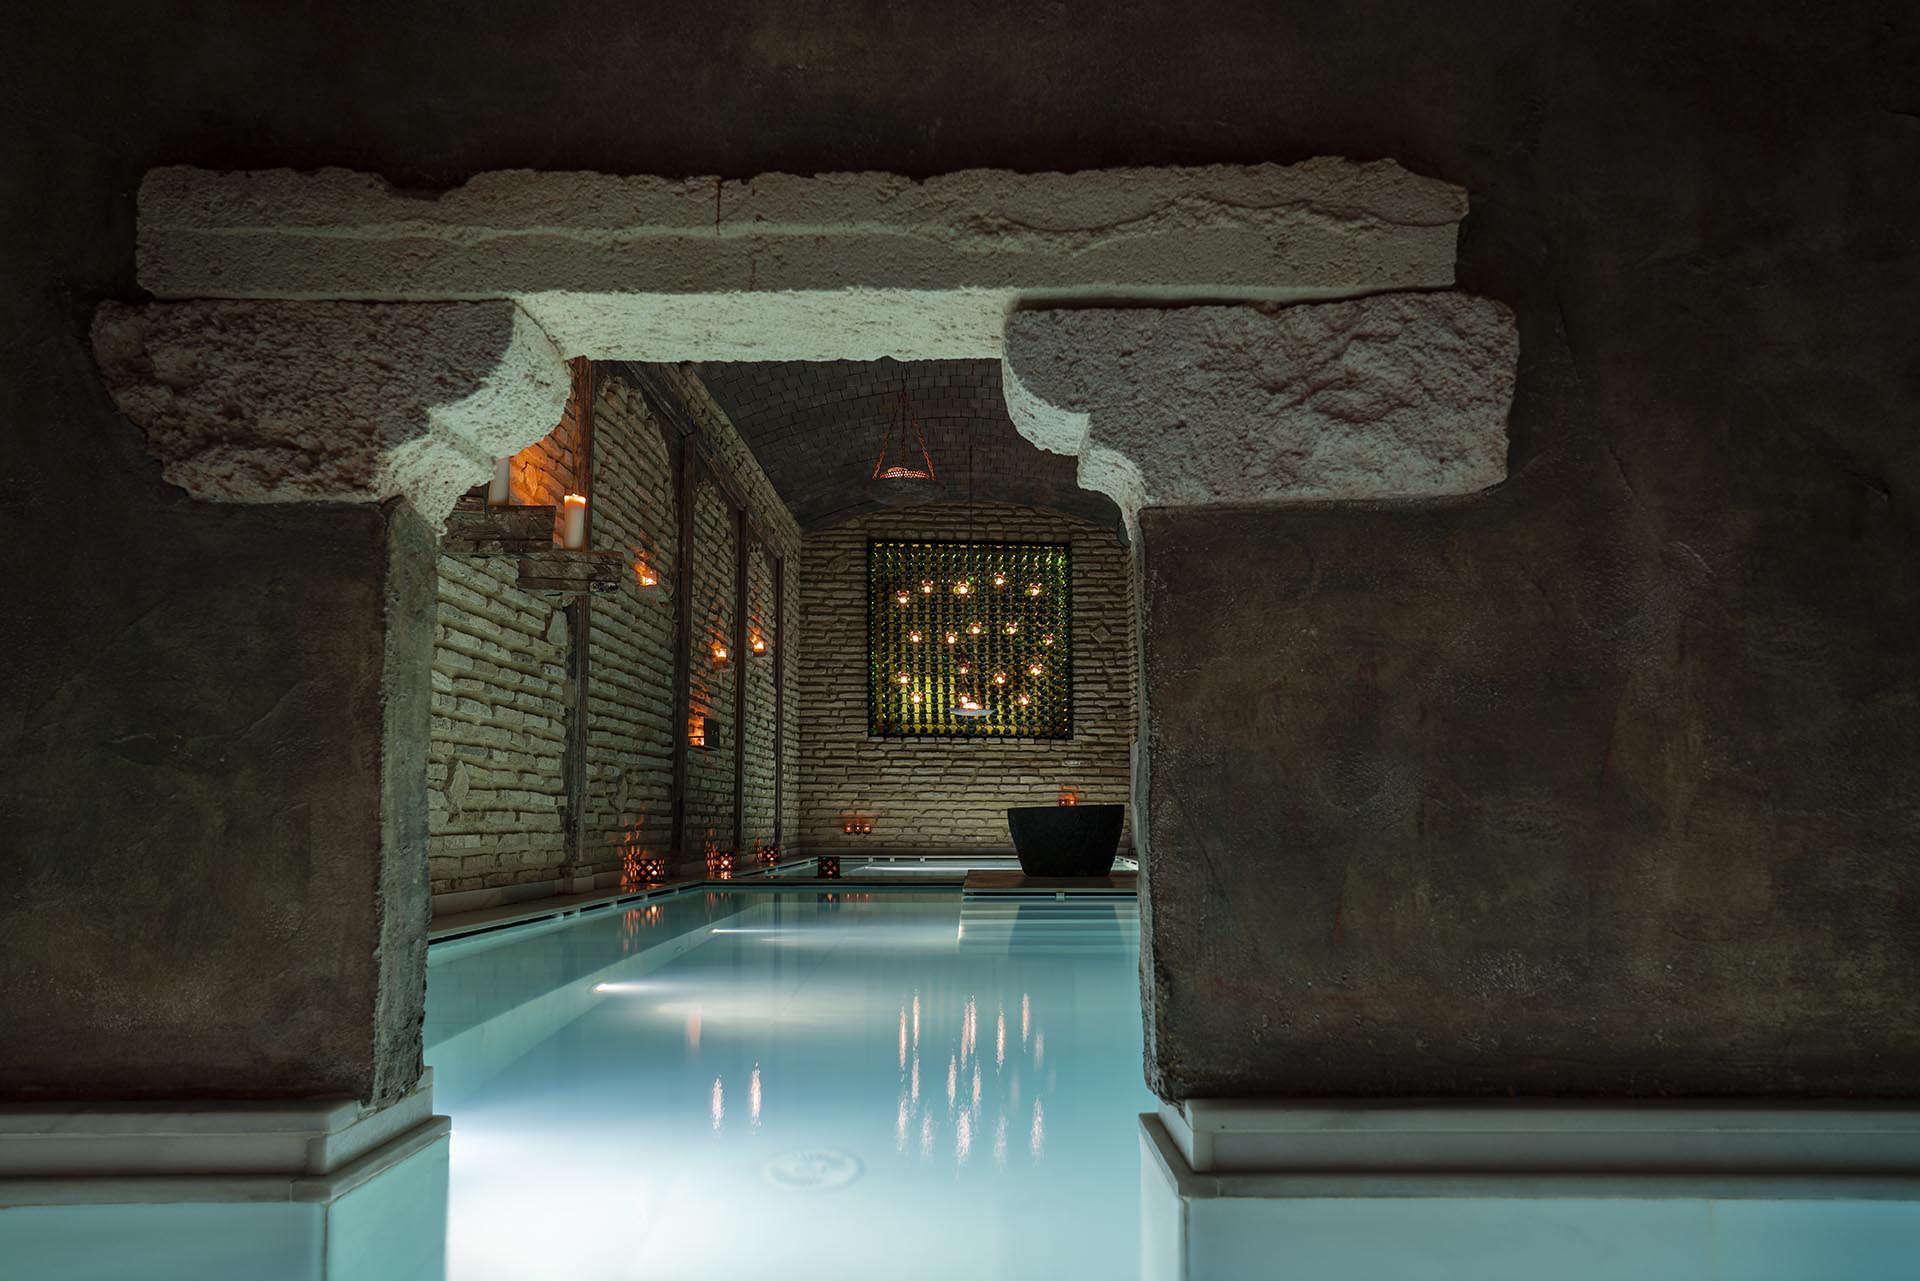 ancient, underground spa baths at Aire Hotel & Spa Almeria